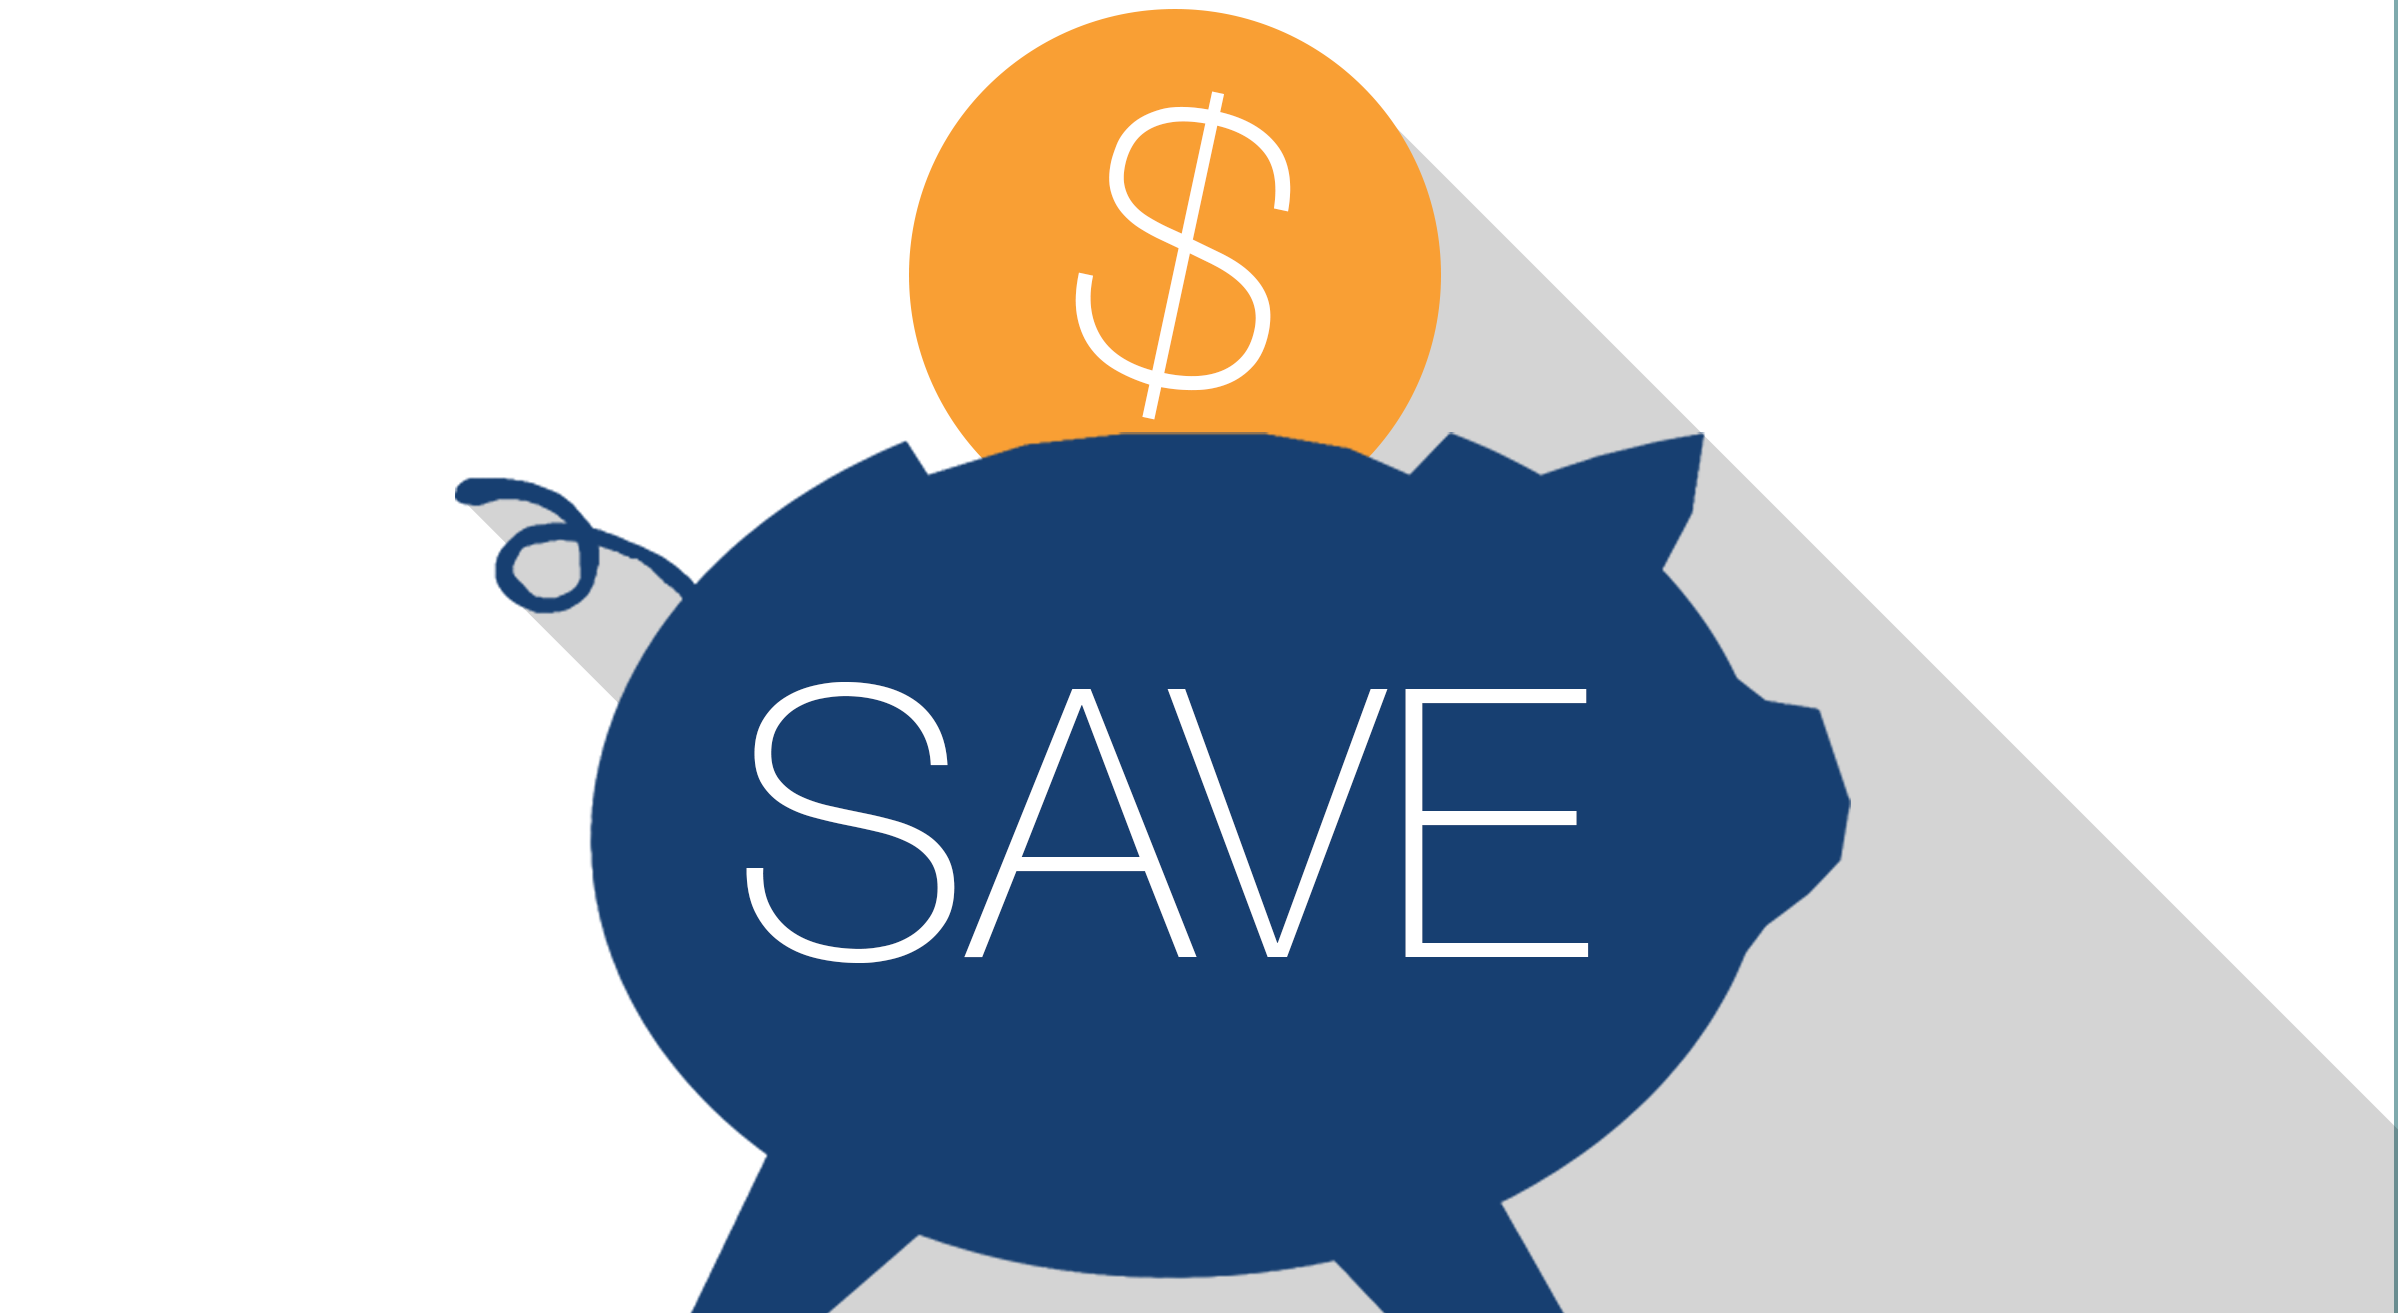 save on telephone bills